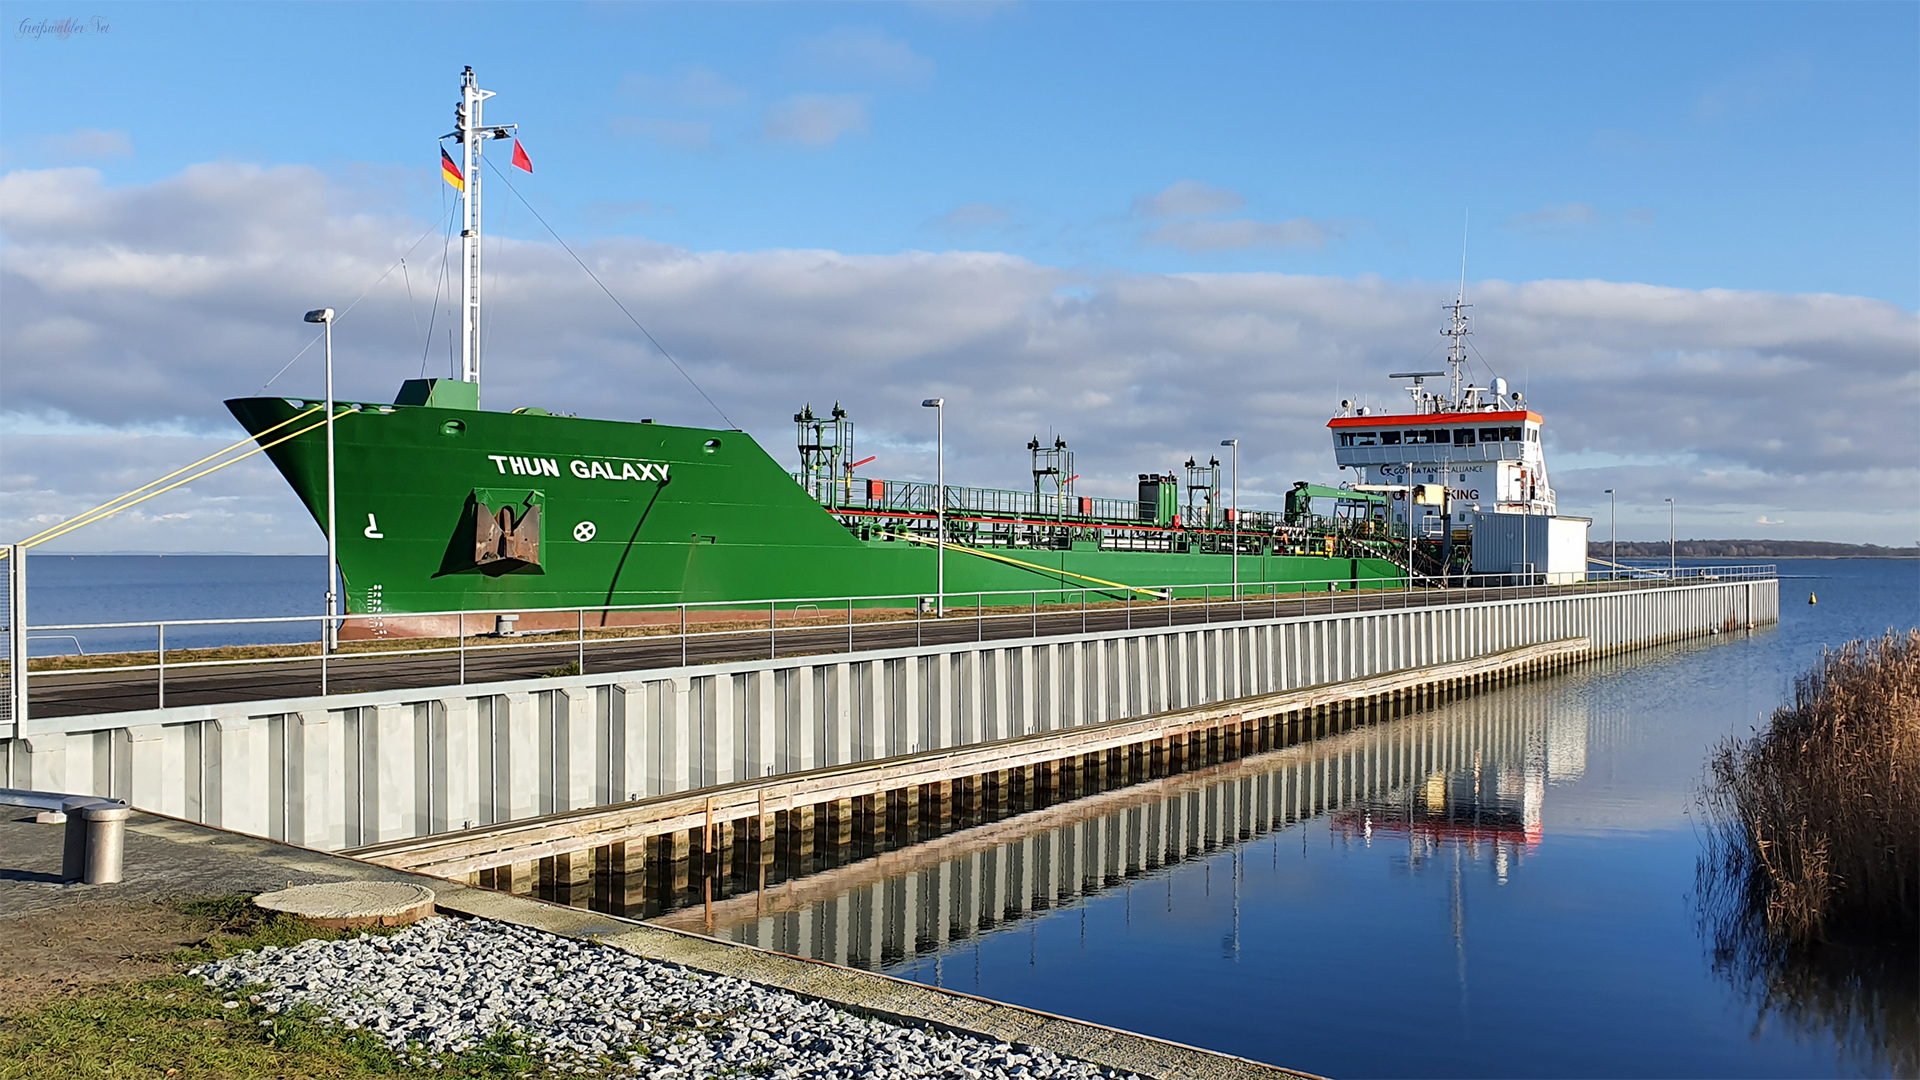 Tanker THUN GALAXY im Seehafen Greifswald-Ladebow